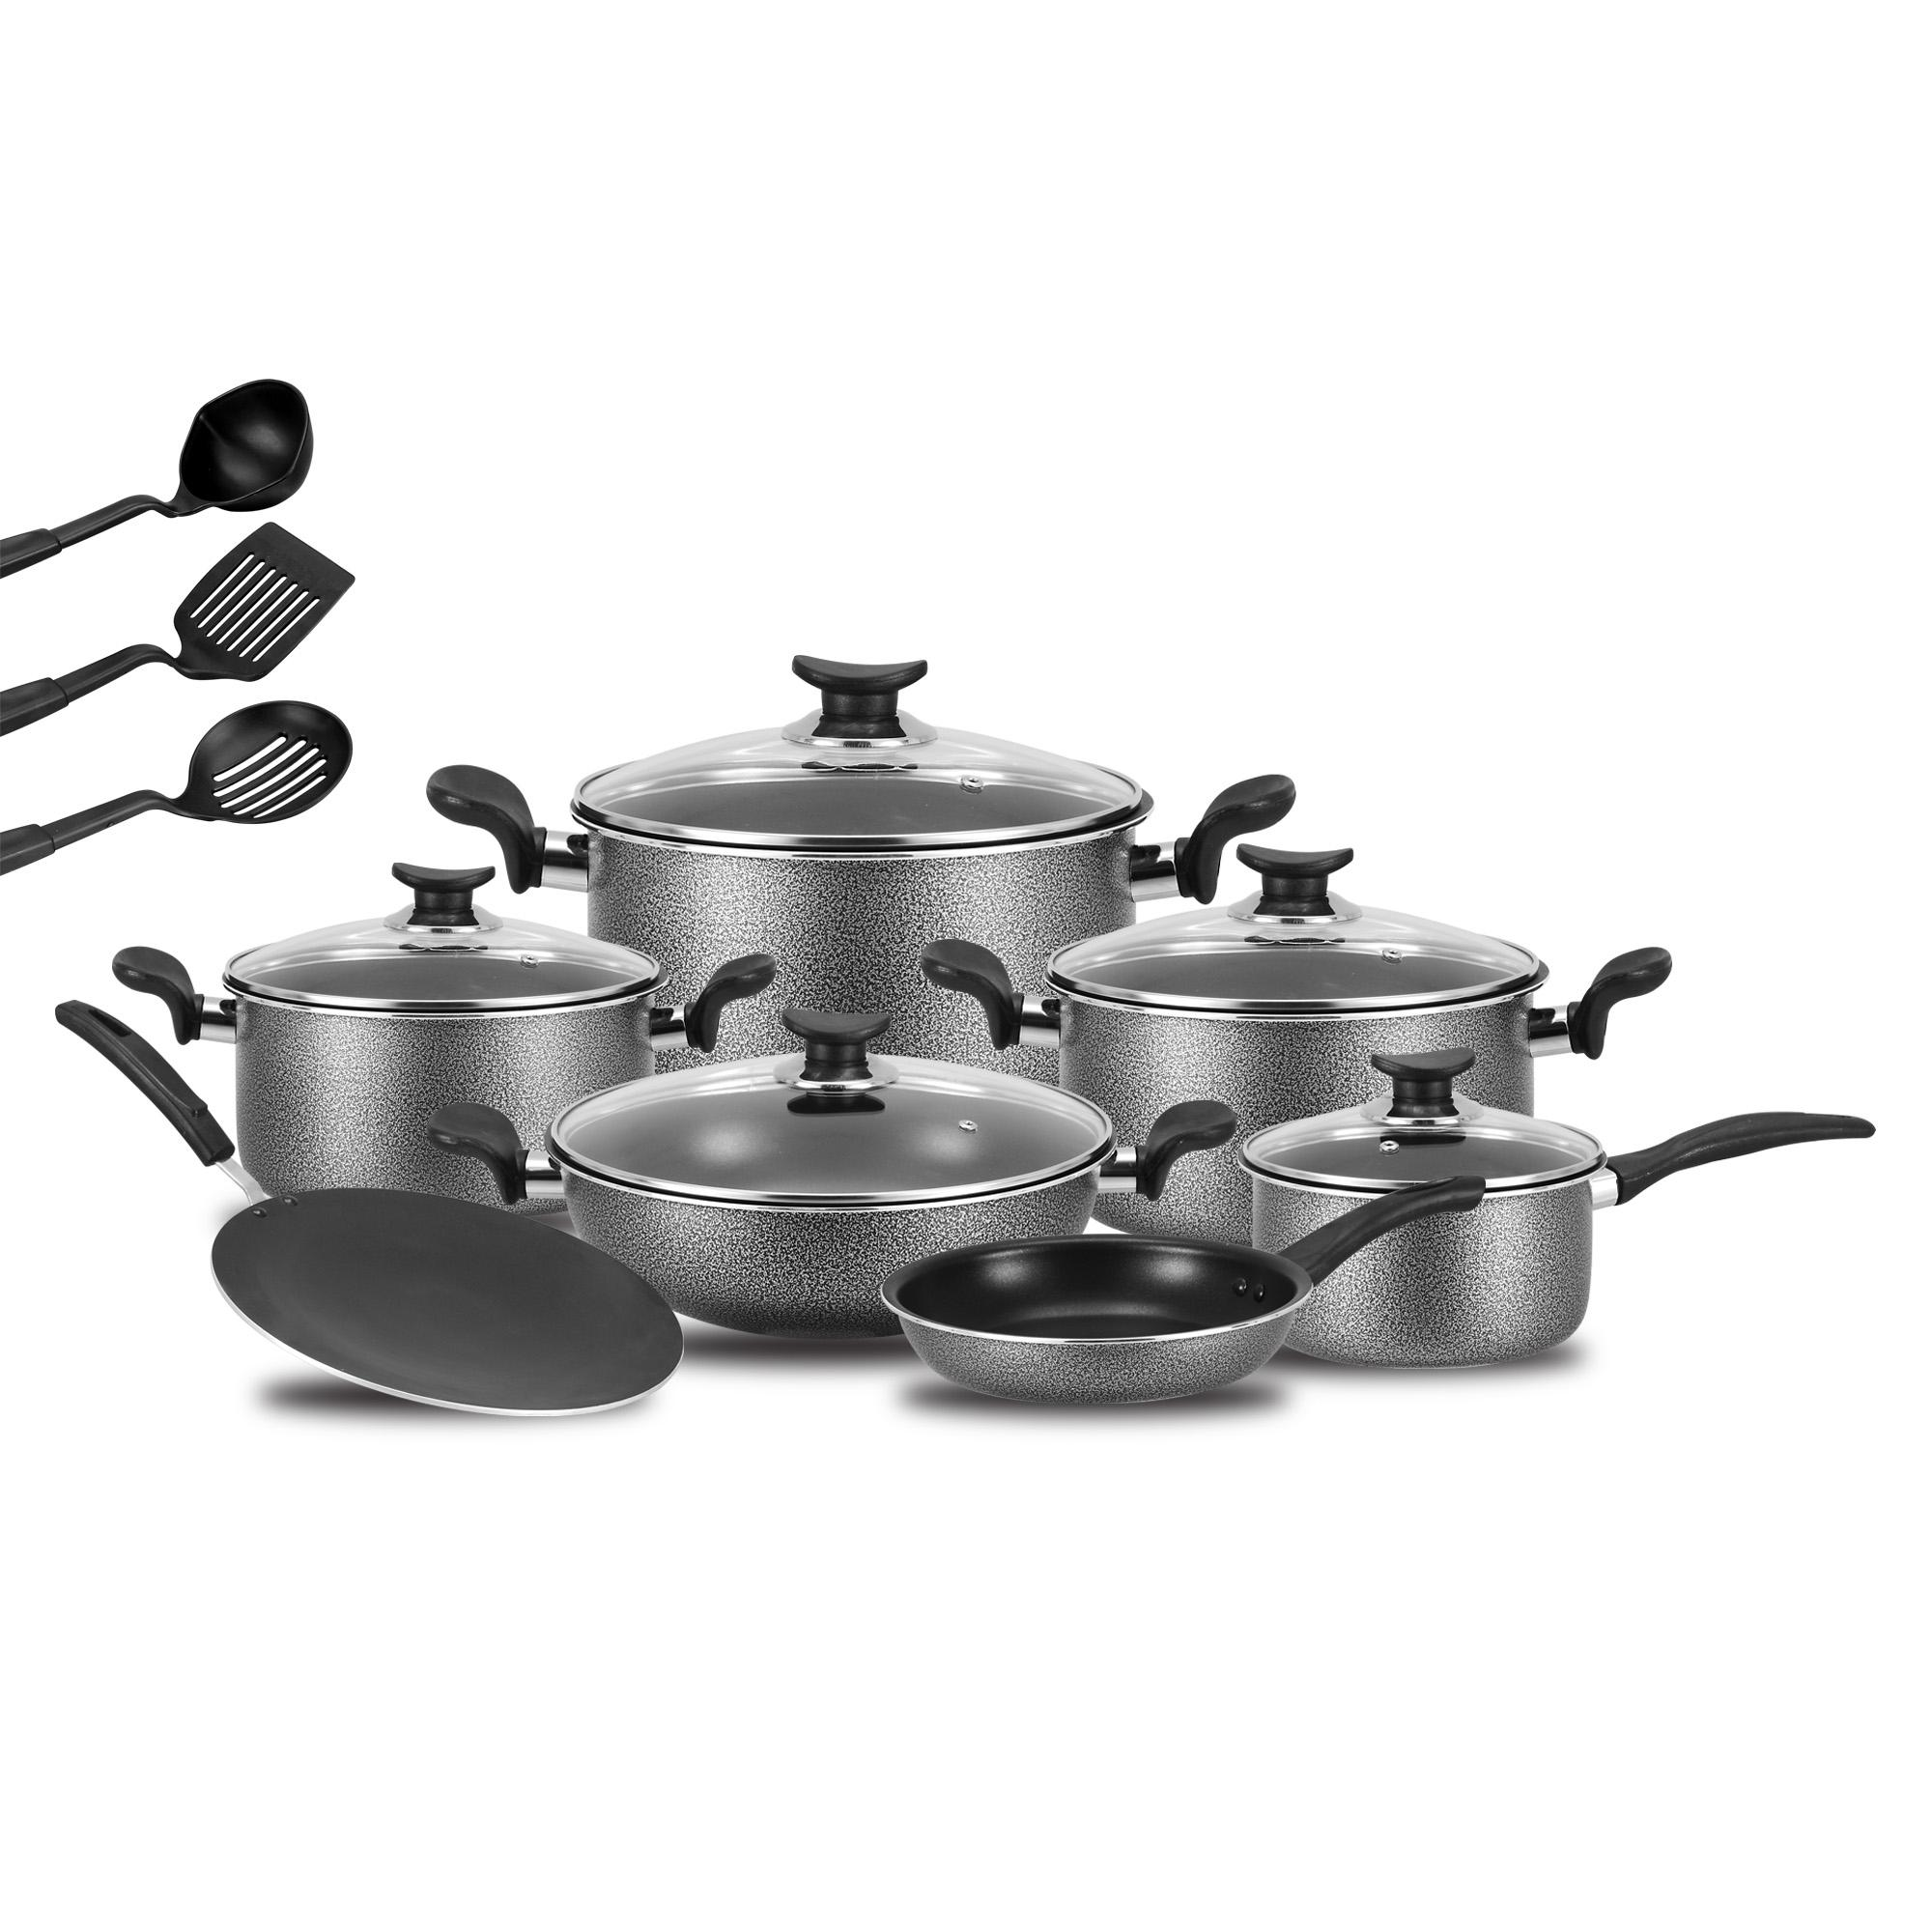 Non Stick Cookware Set - 15 Pcs - Grey & Black